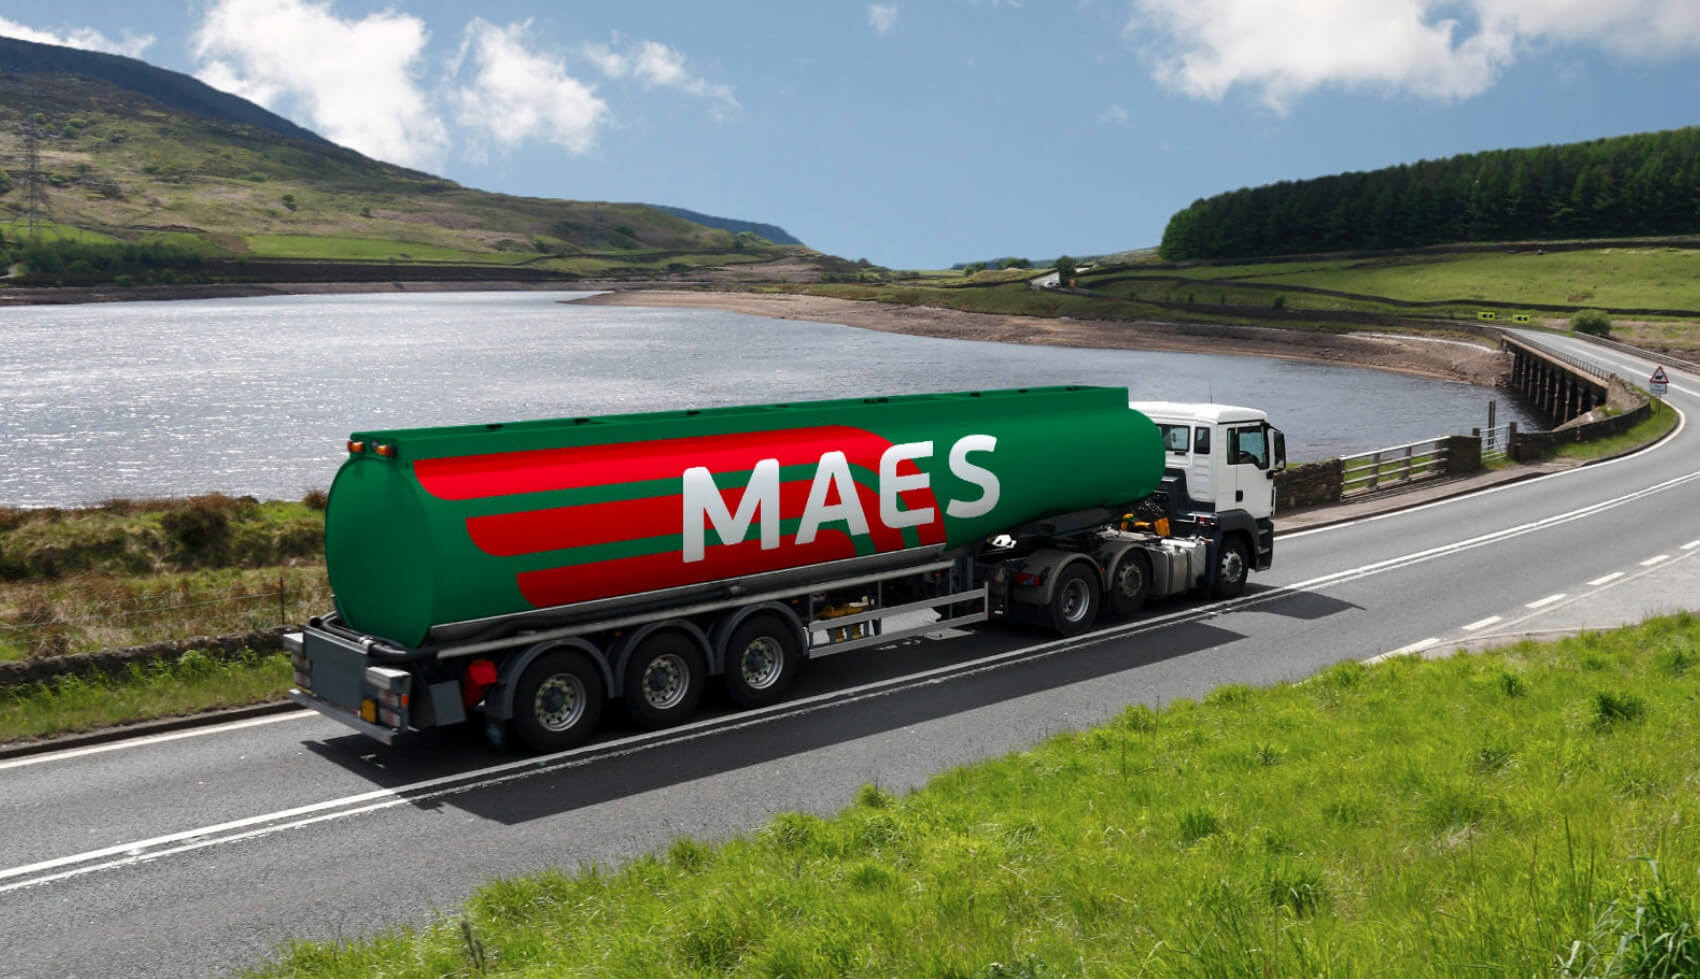 maes-tankwagen-brand-onlyhumans-1700x979